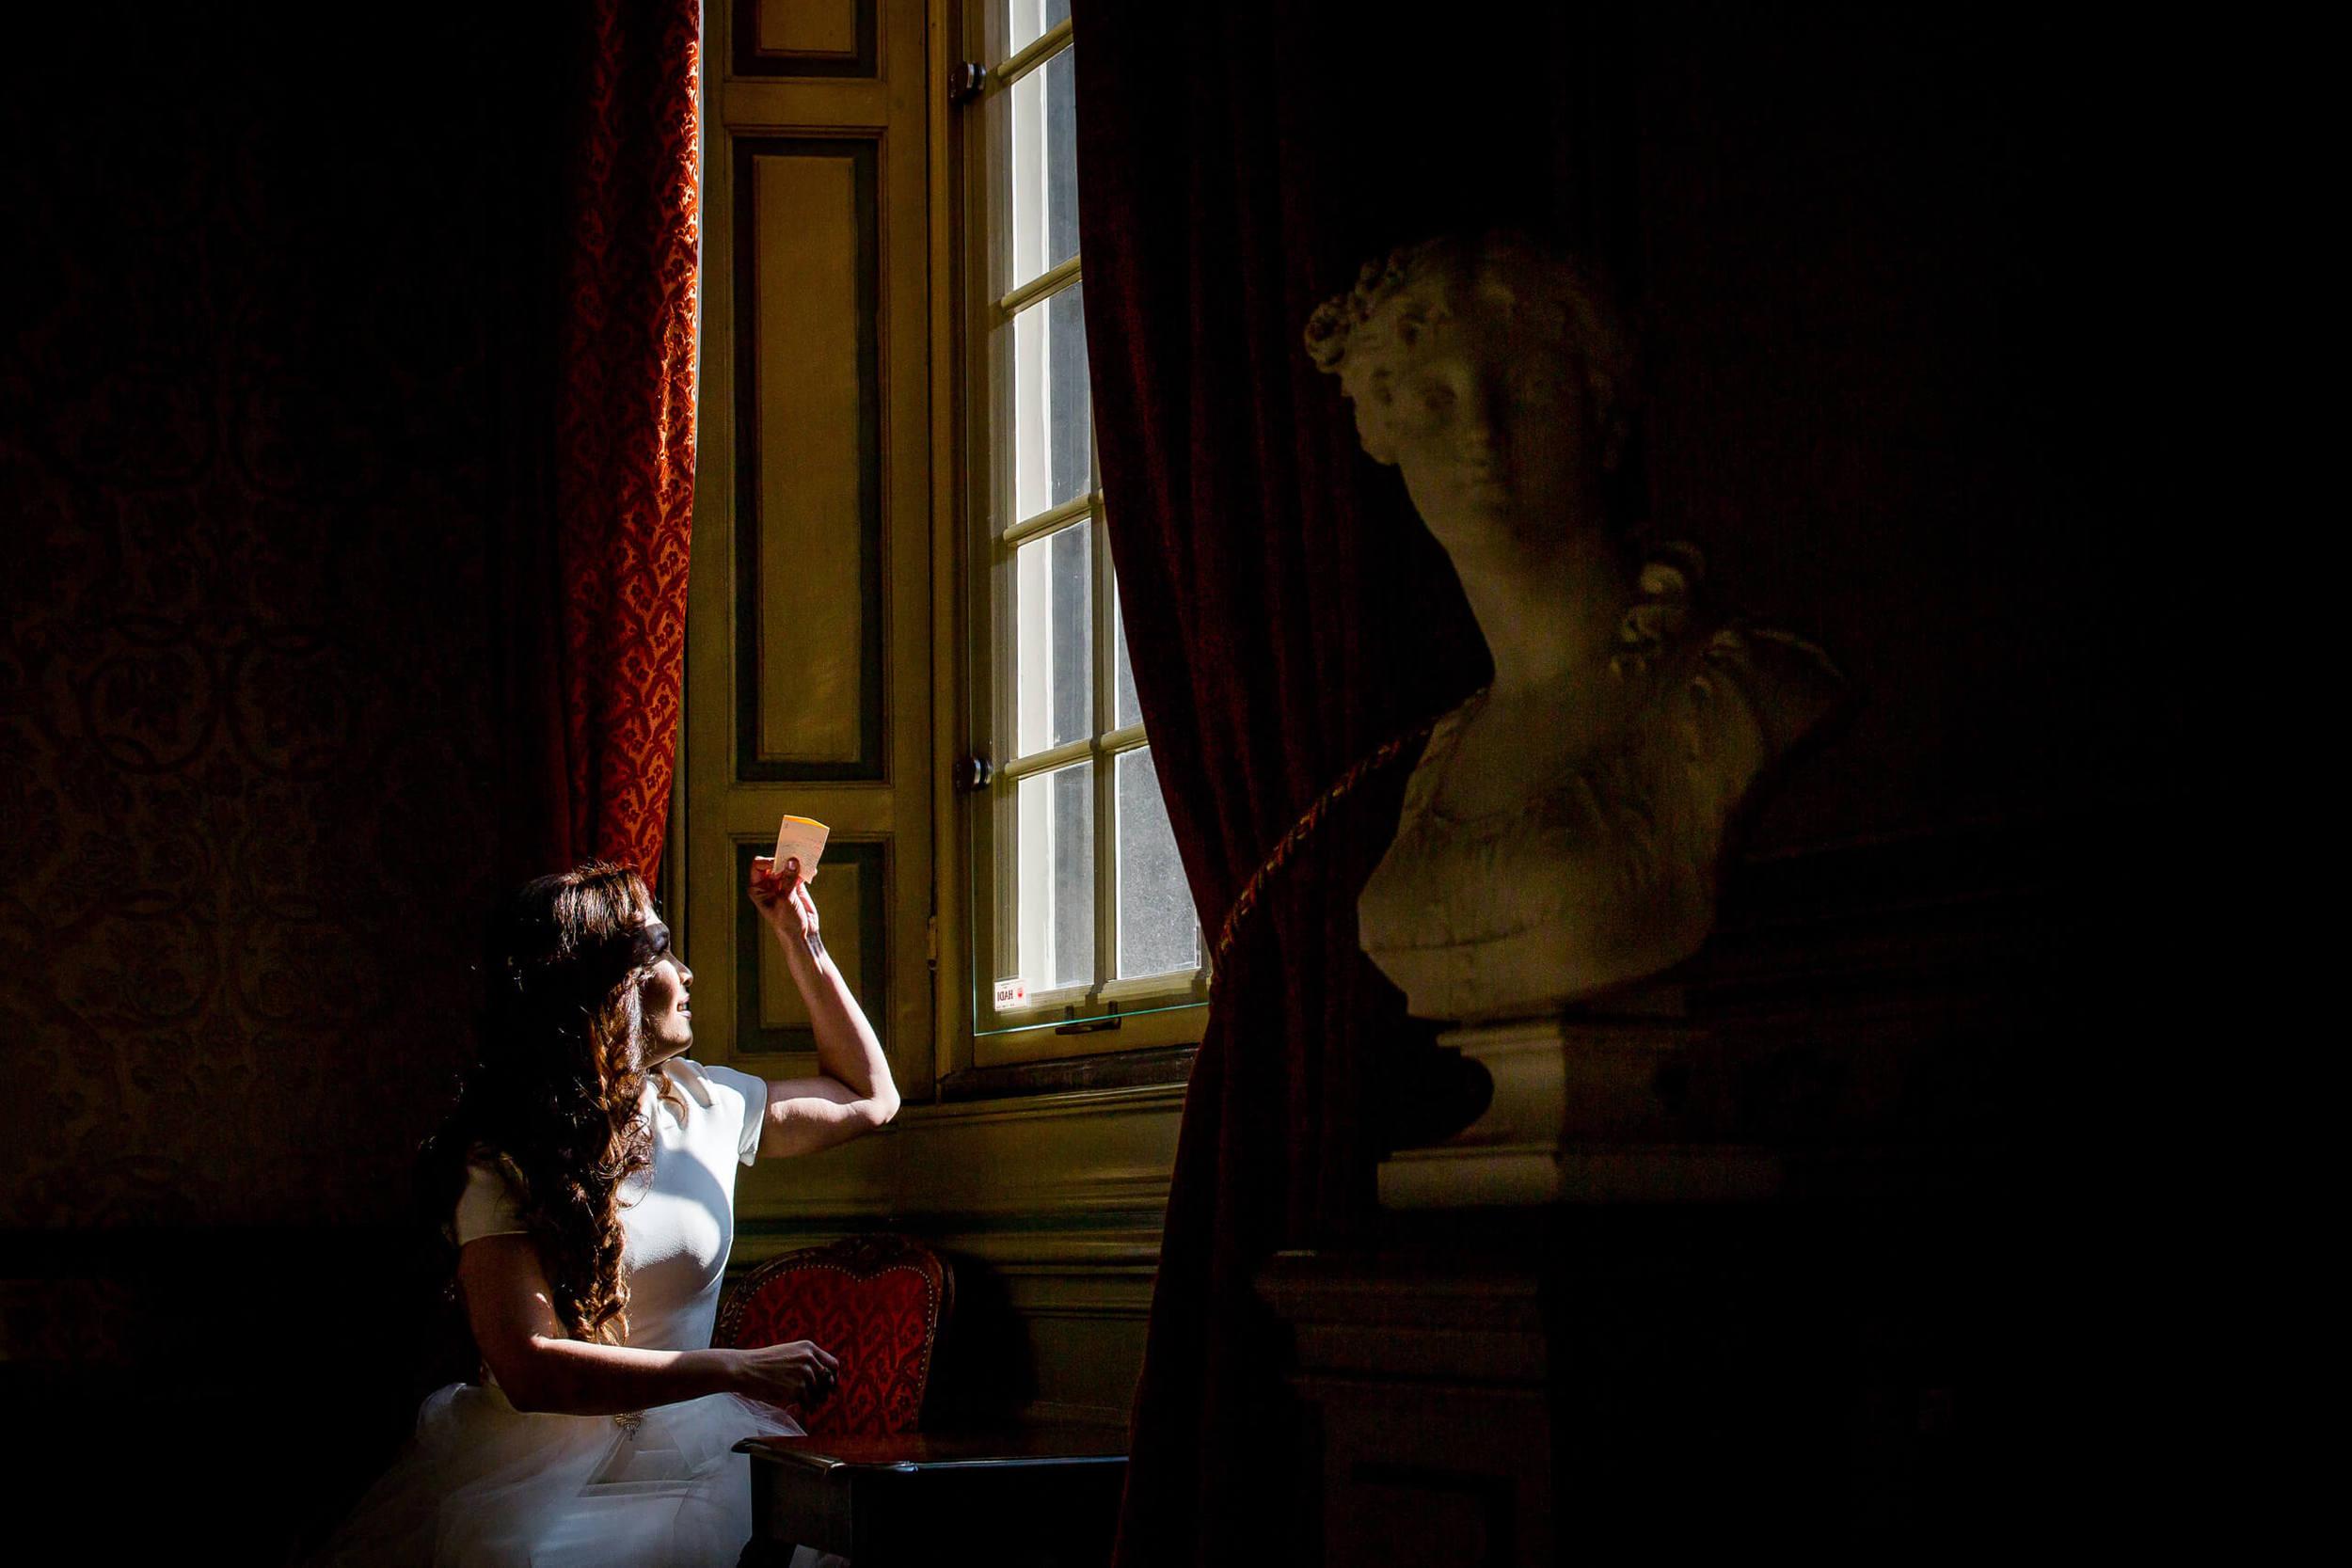 Bruidsfotograaf_Den_Haag_7.jpg